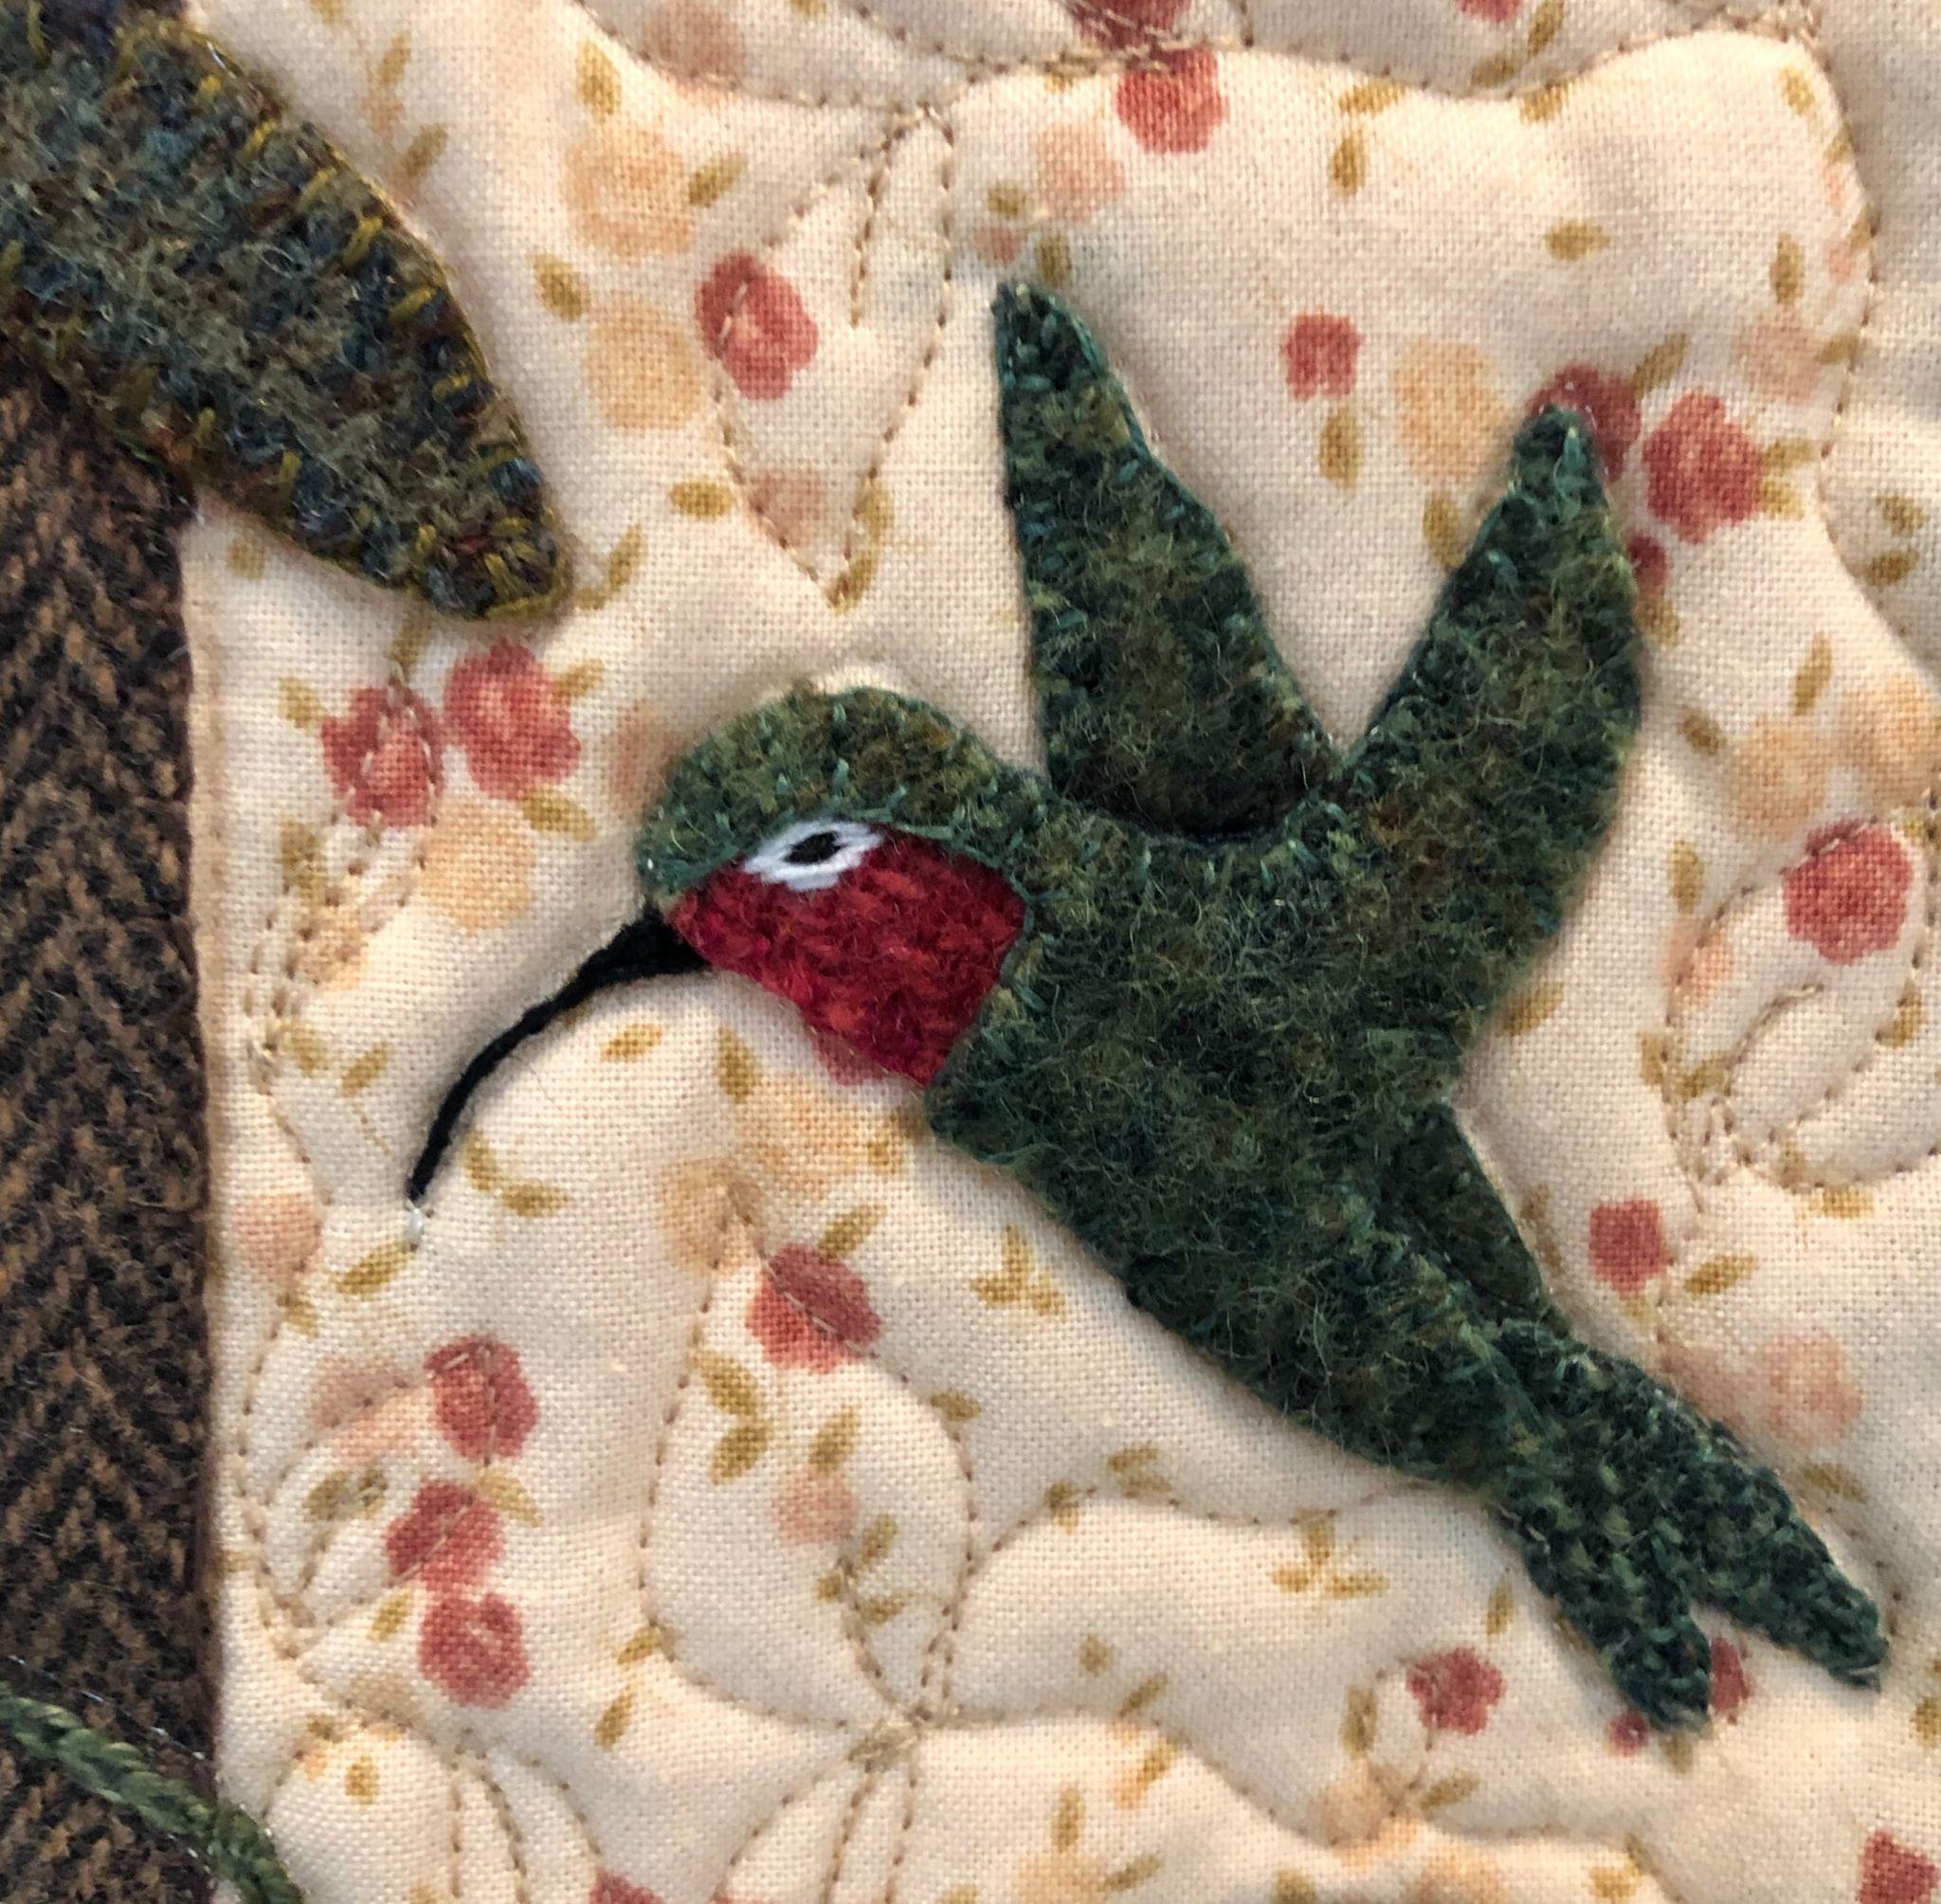 Primitive Garden Quilt Patterns For All The Little Extras Rhonda Dort Garden Quilt Quilts Primitive